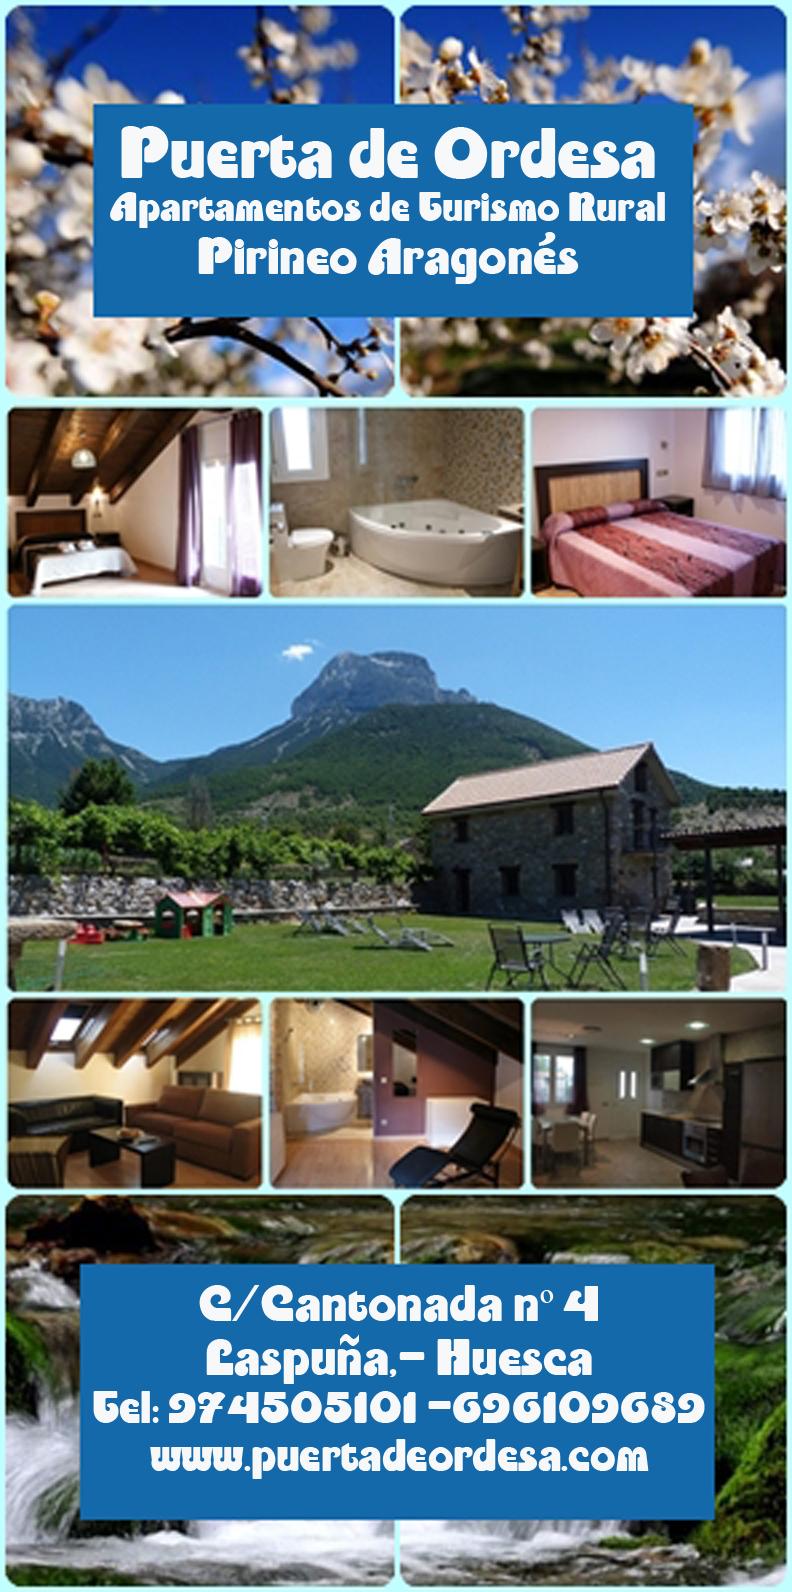 Alojarse en el Pirineo